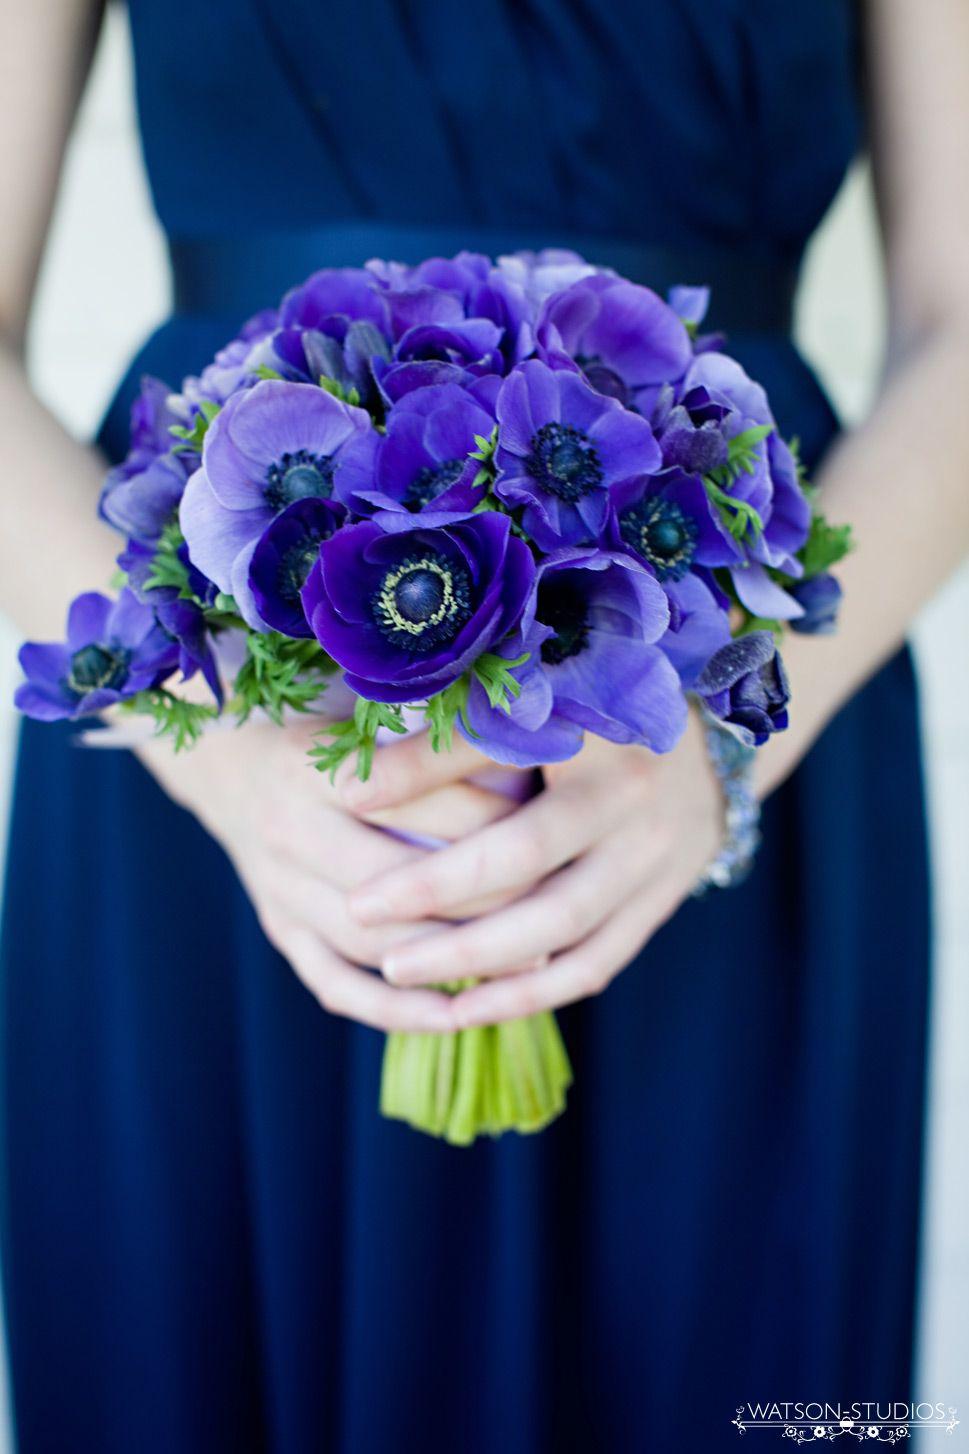 blue anemone wedding flower bouquet, bridal bouquet